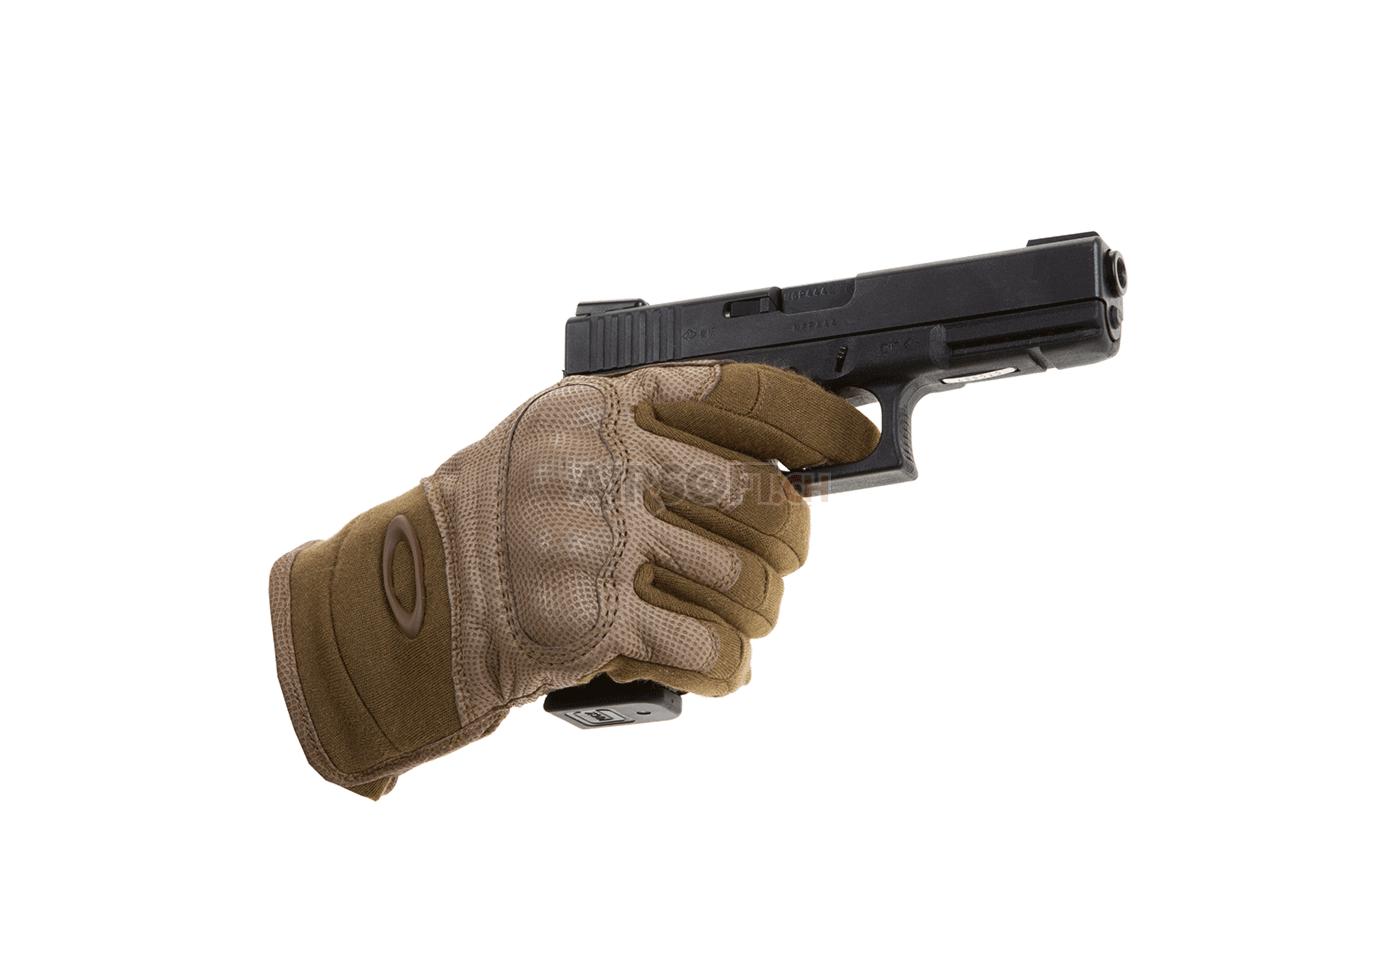 SI Tactical FR Gloves Coyote (Oakley) M - Einsatzhandschuhe - Handschuhe -  Bekleidung - airsoft.ch Onlineshop 8b0228b75fcc